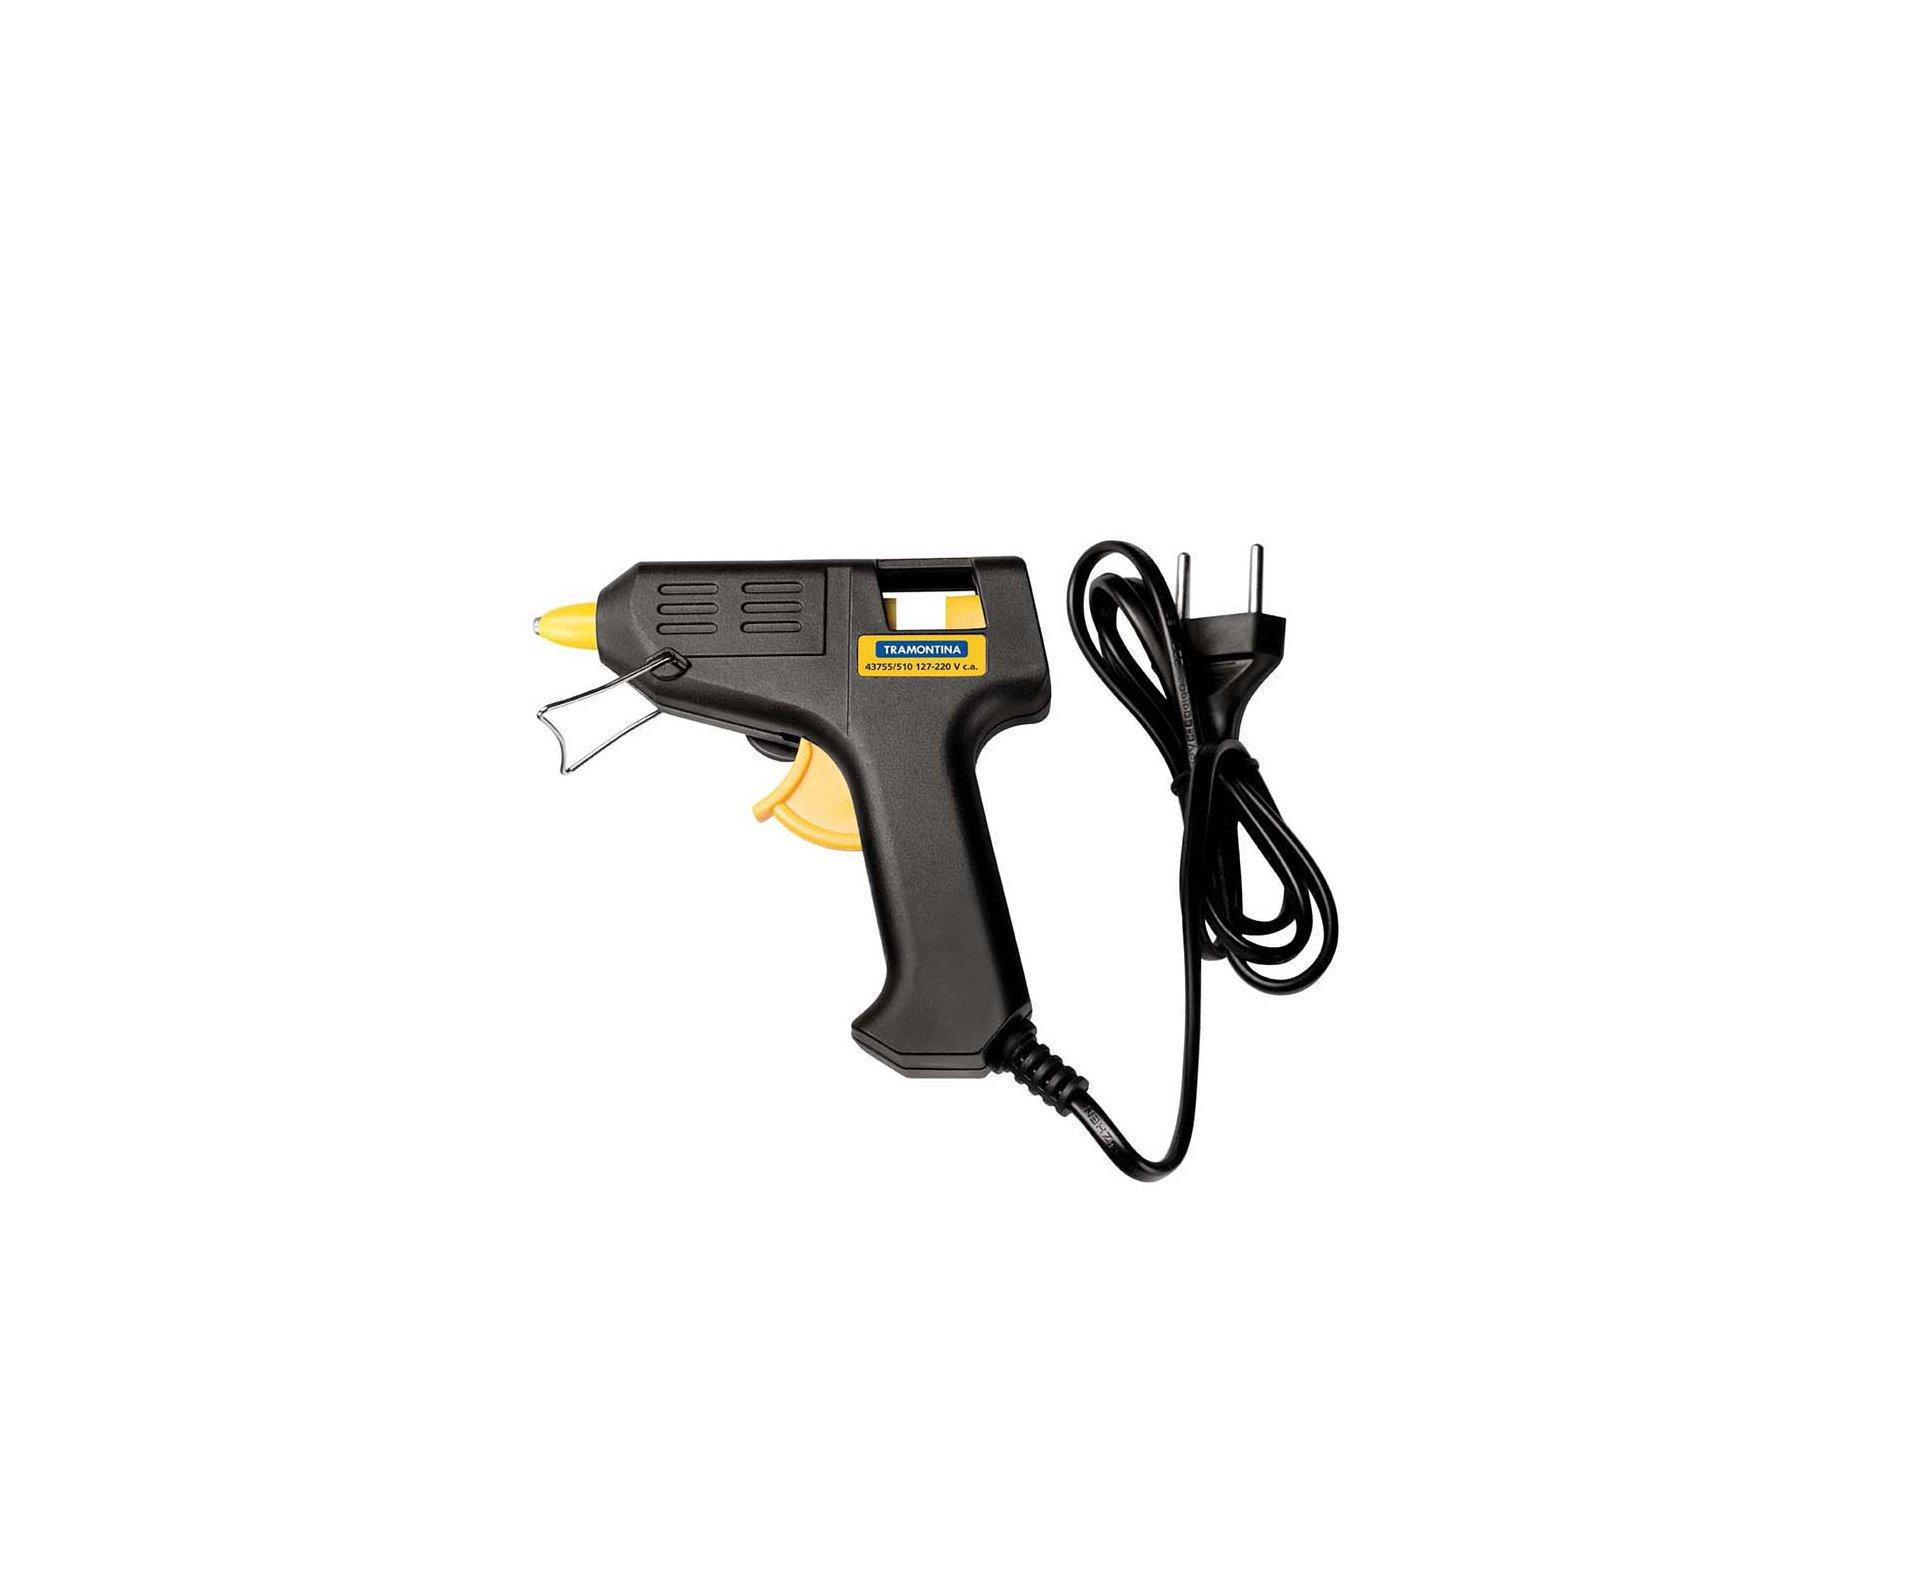 Pistola De Cola Quente Elétrica 30-40 W Bivolt - Tramontina